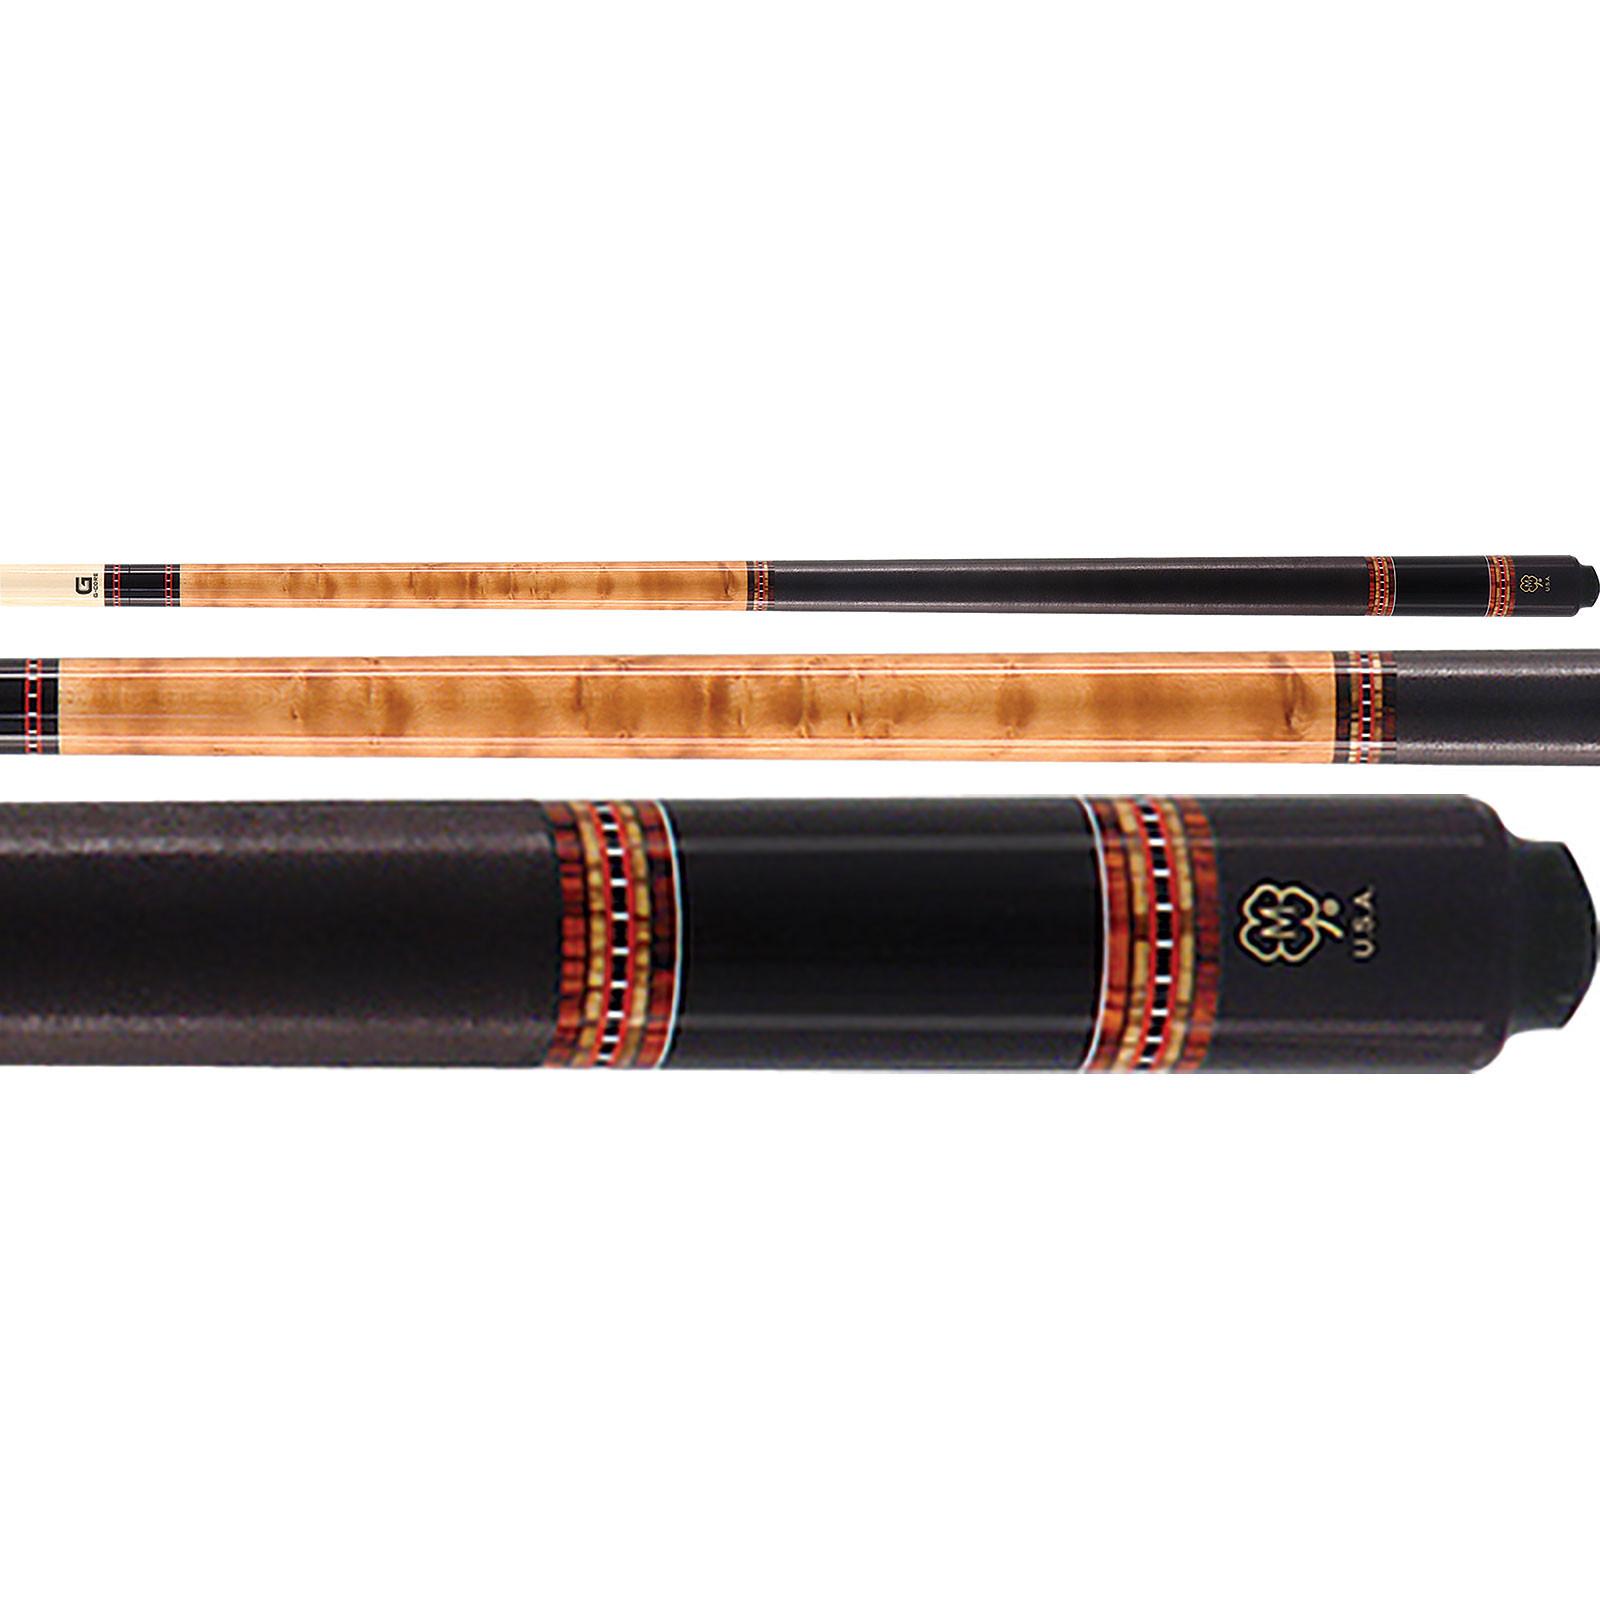 McDermott G225 G-Series Natural Walnut Pool Cue